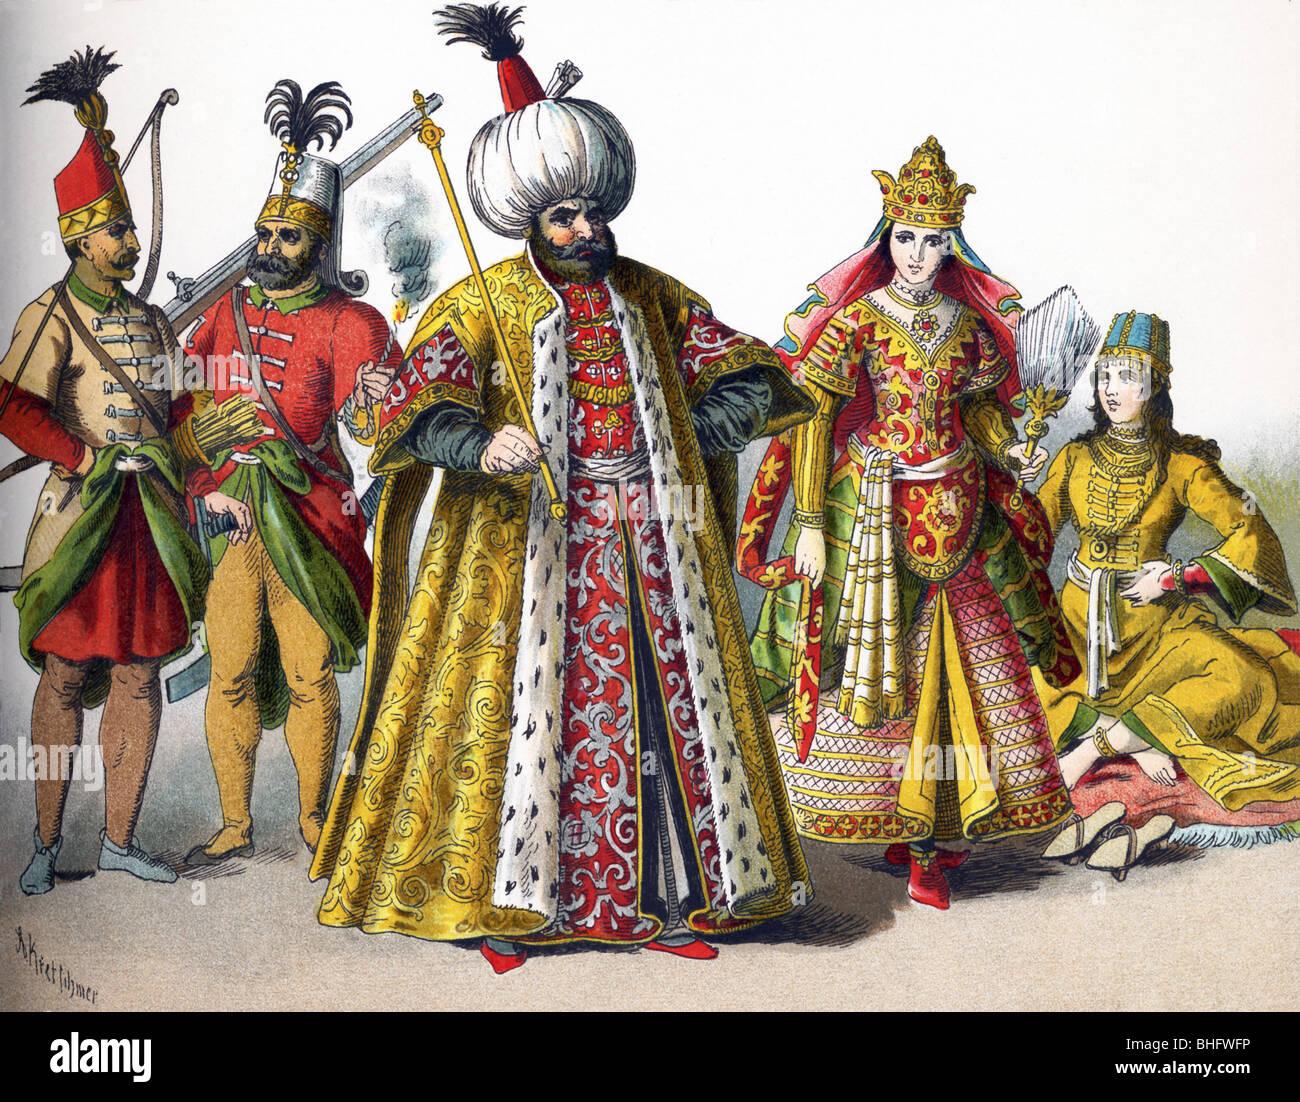 These Ottoman Empire Figures In 1500 Represent A Guard A